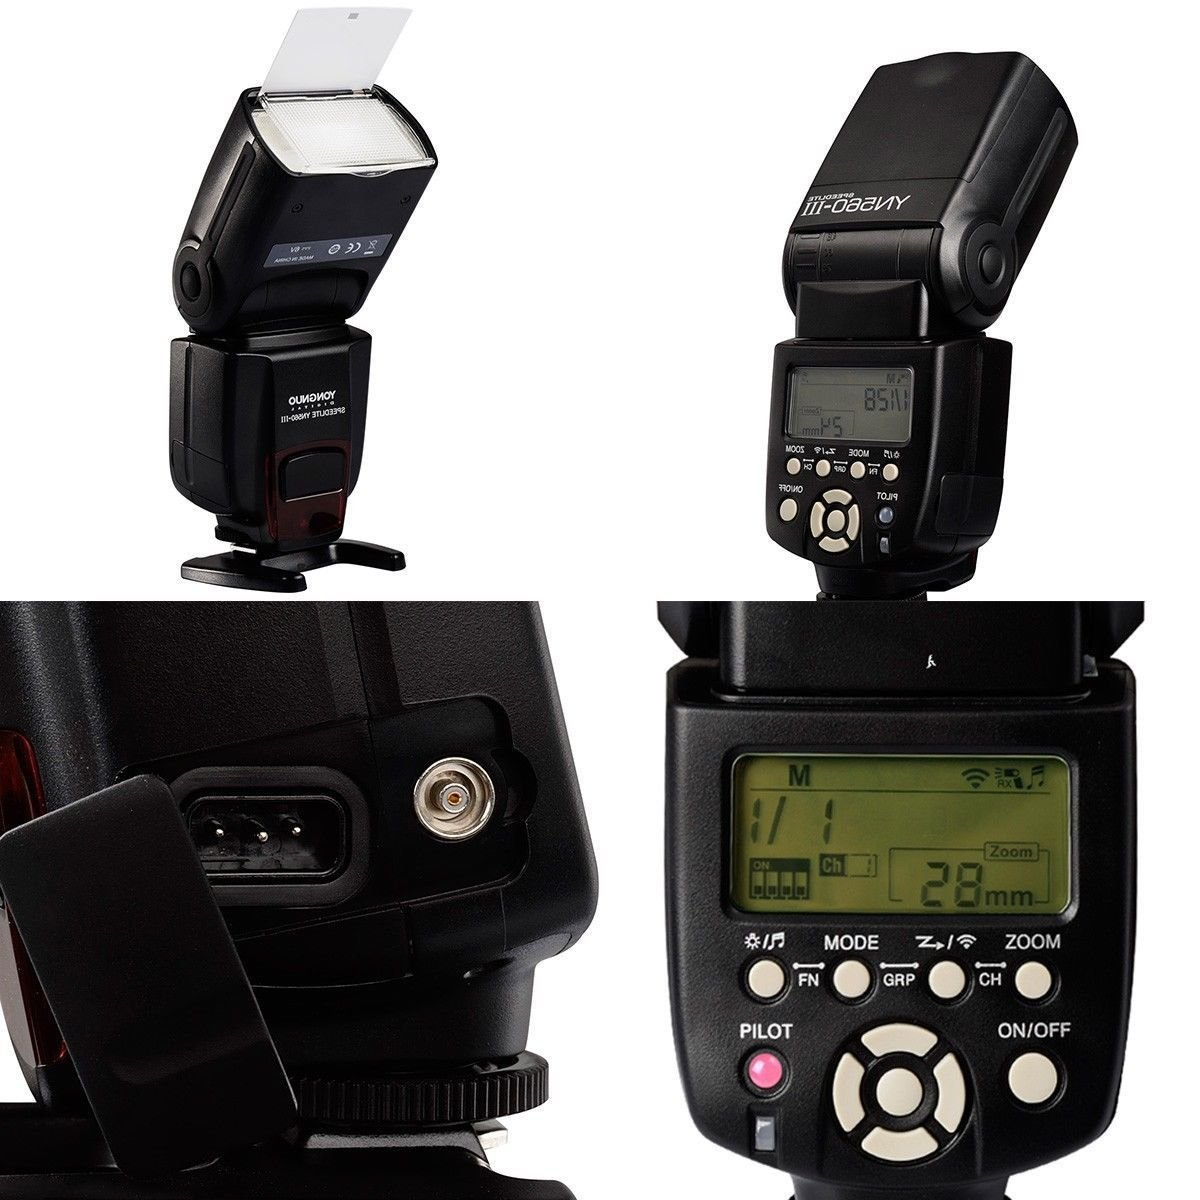 Yongnuo YN560-III Wireless Speedlite Flash for Canon Nikon Camera Photography